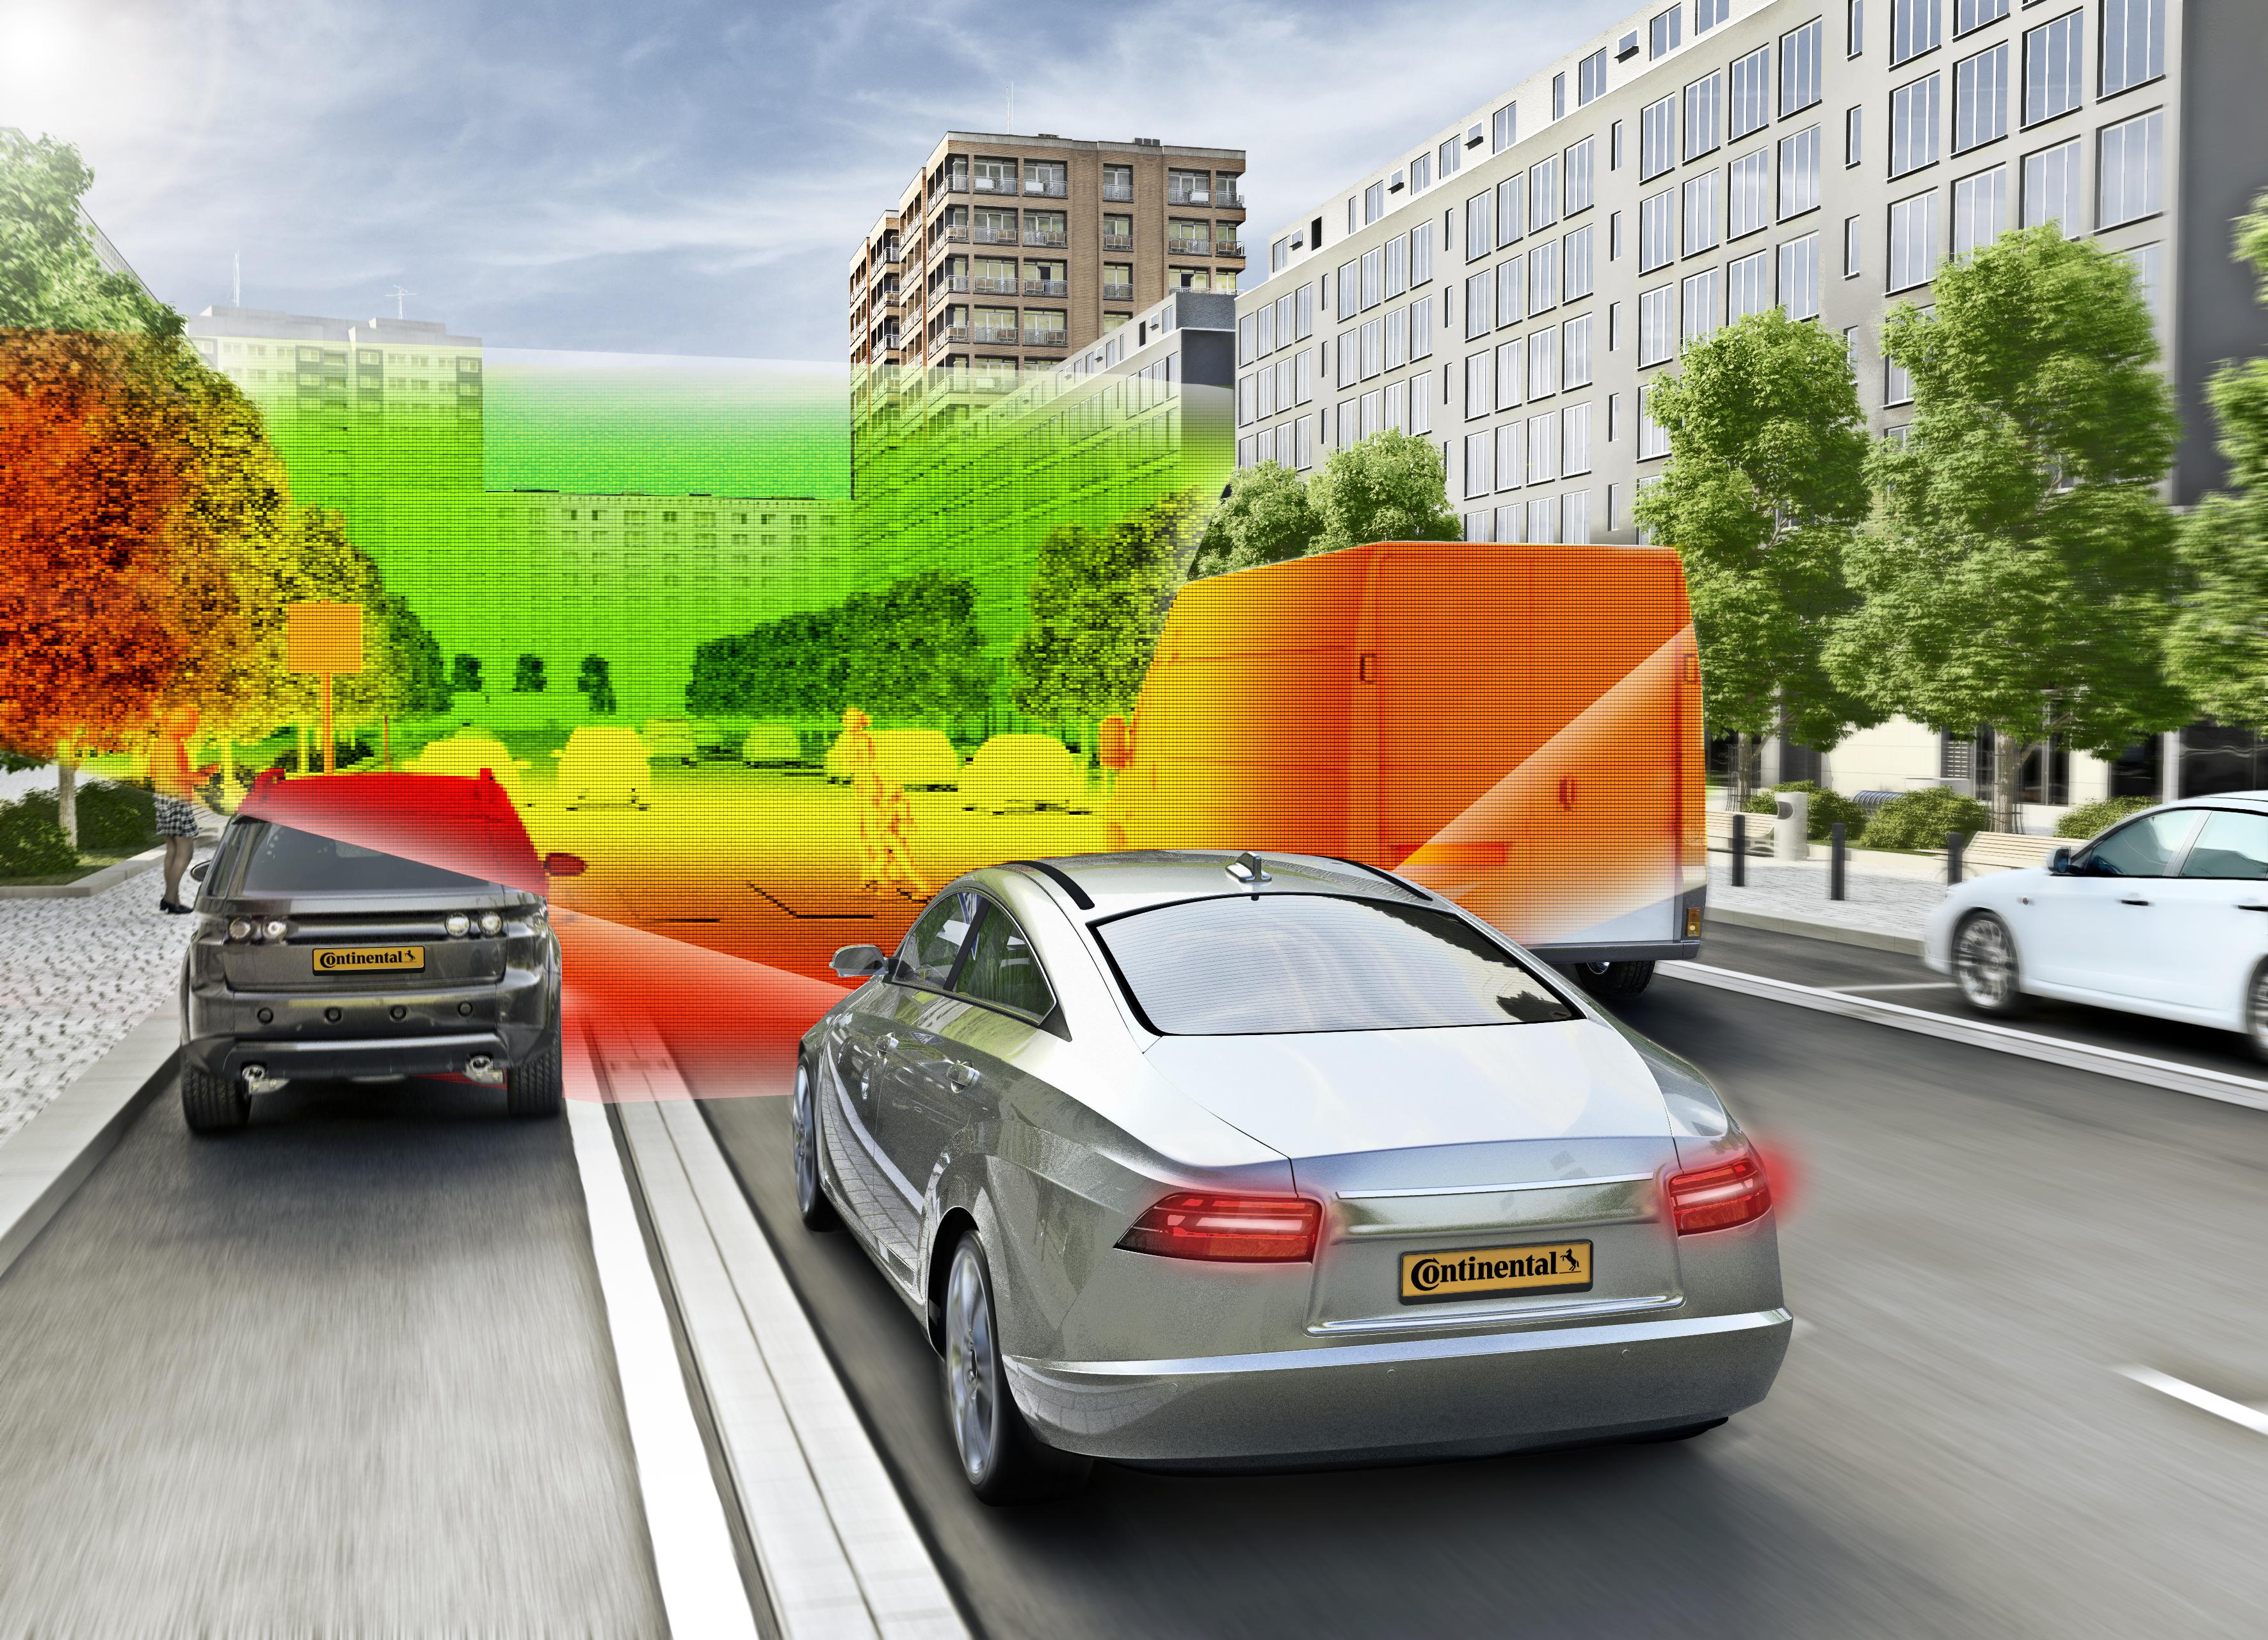 Continental Develops Next-Generation Environment Model